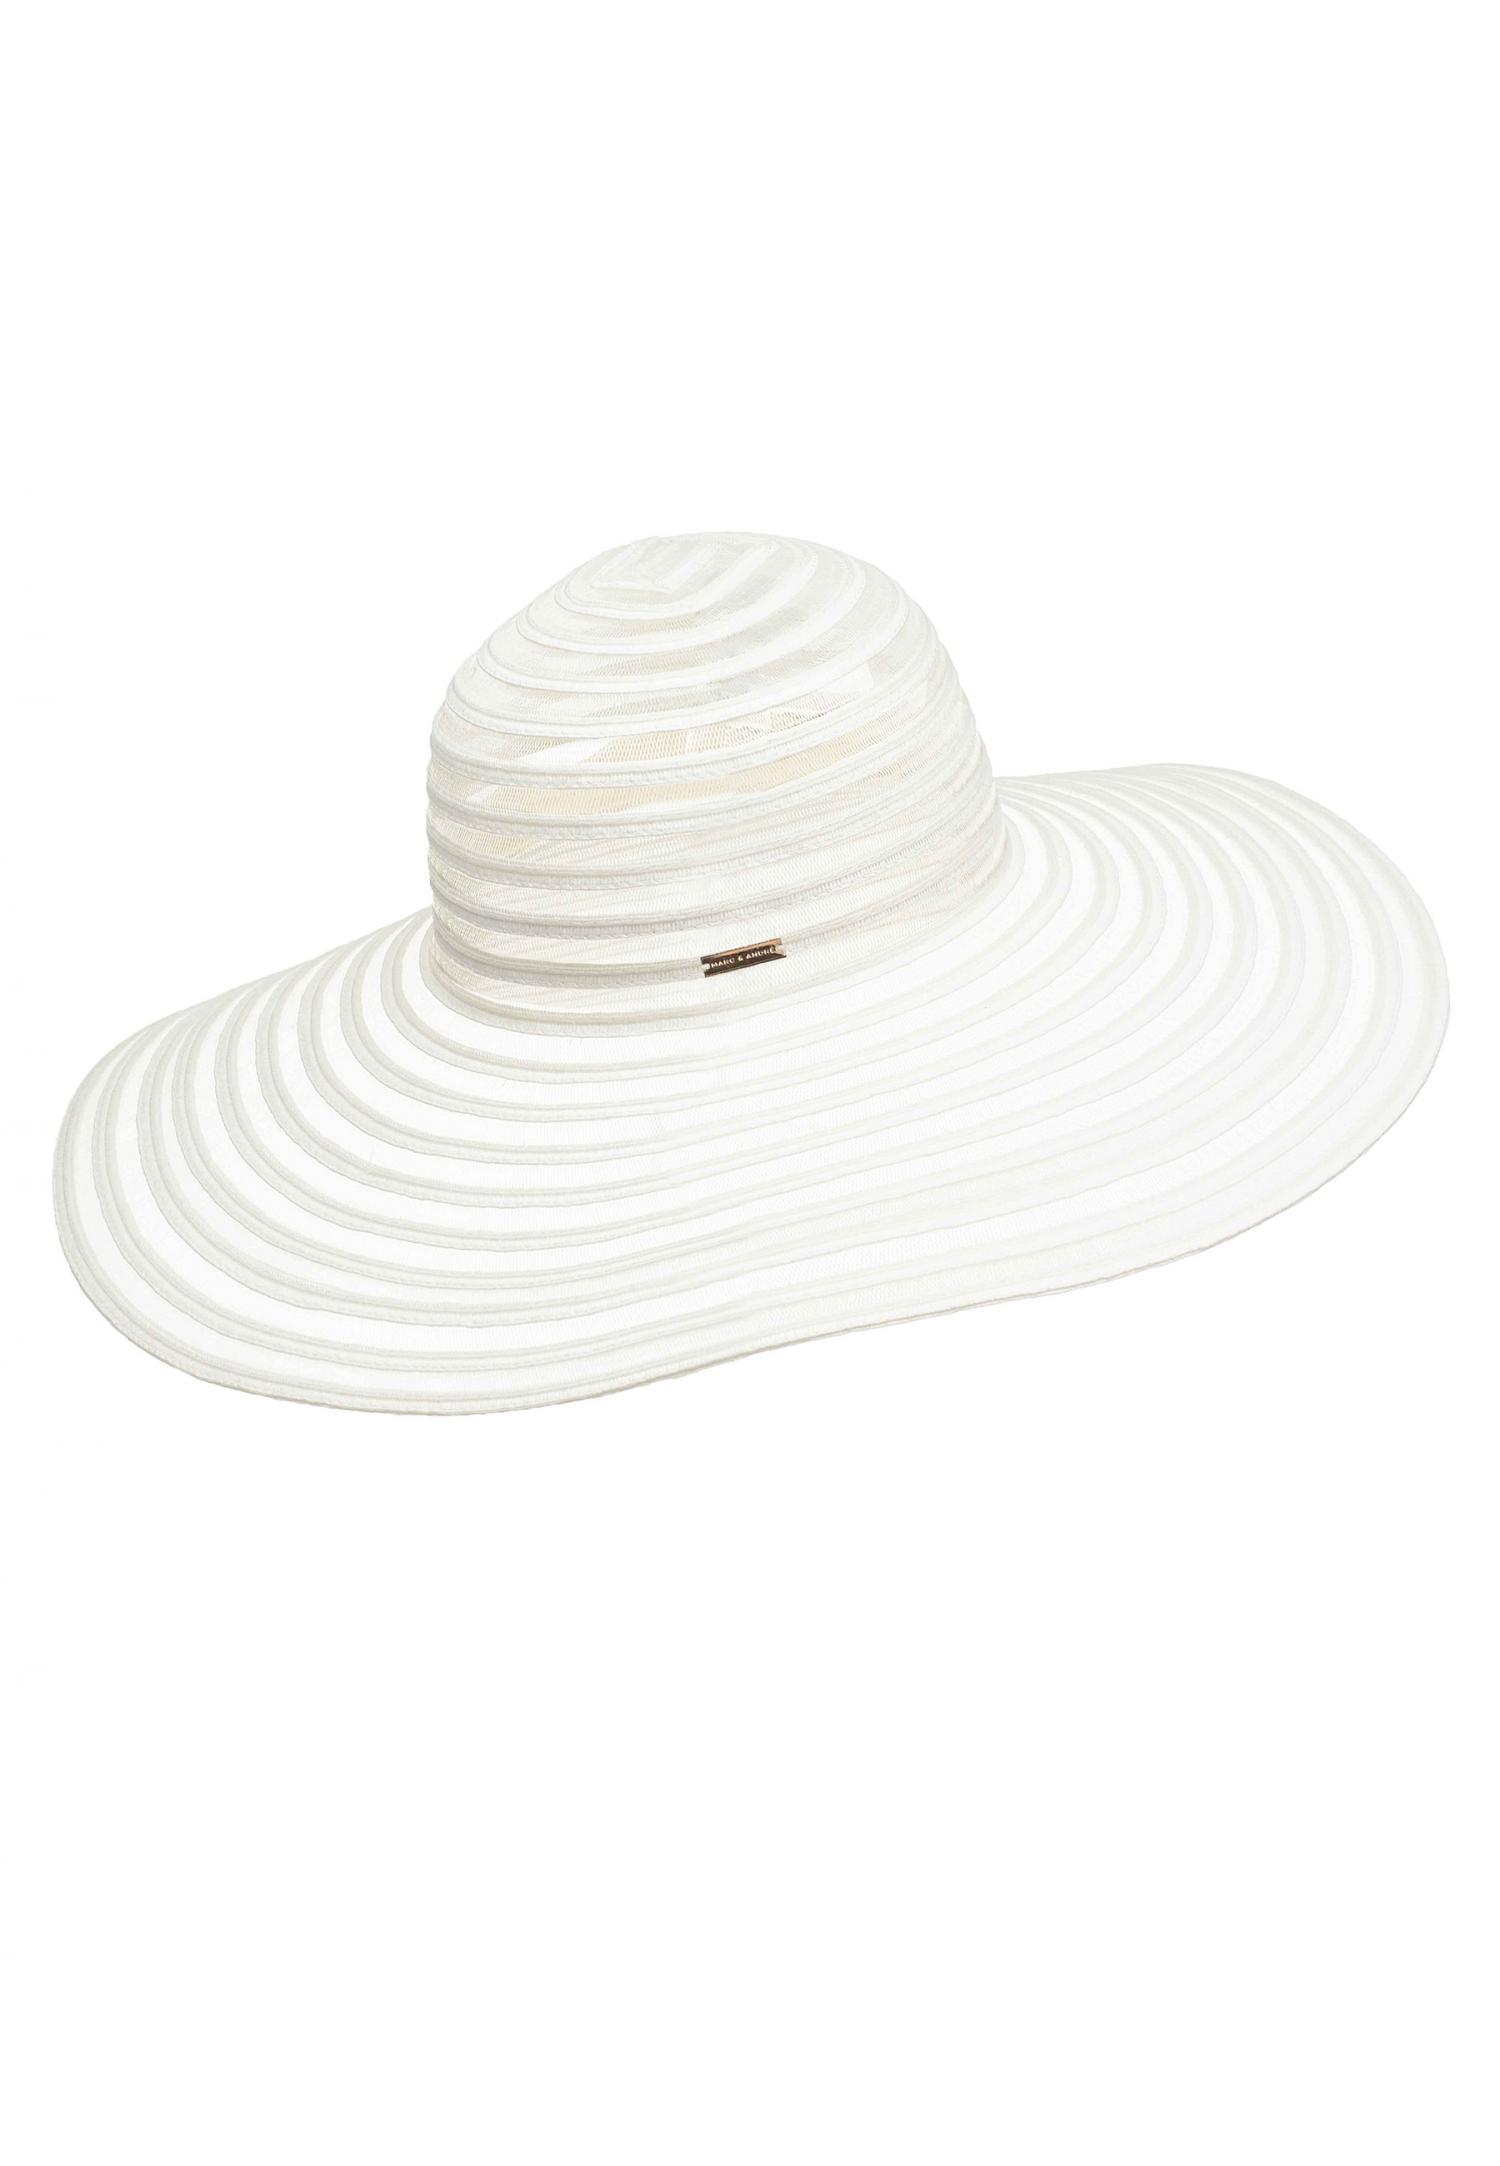 Шляпа HA19-02 Marc & André